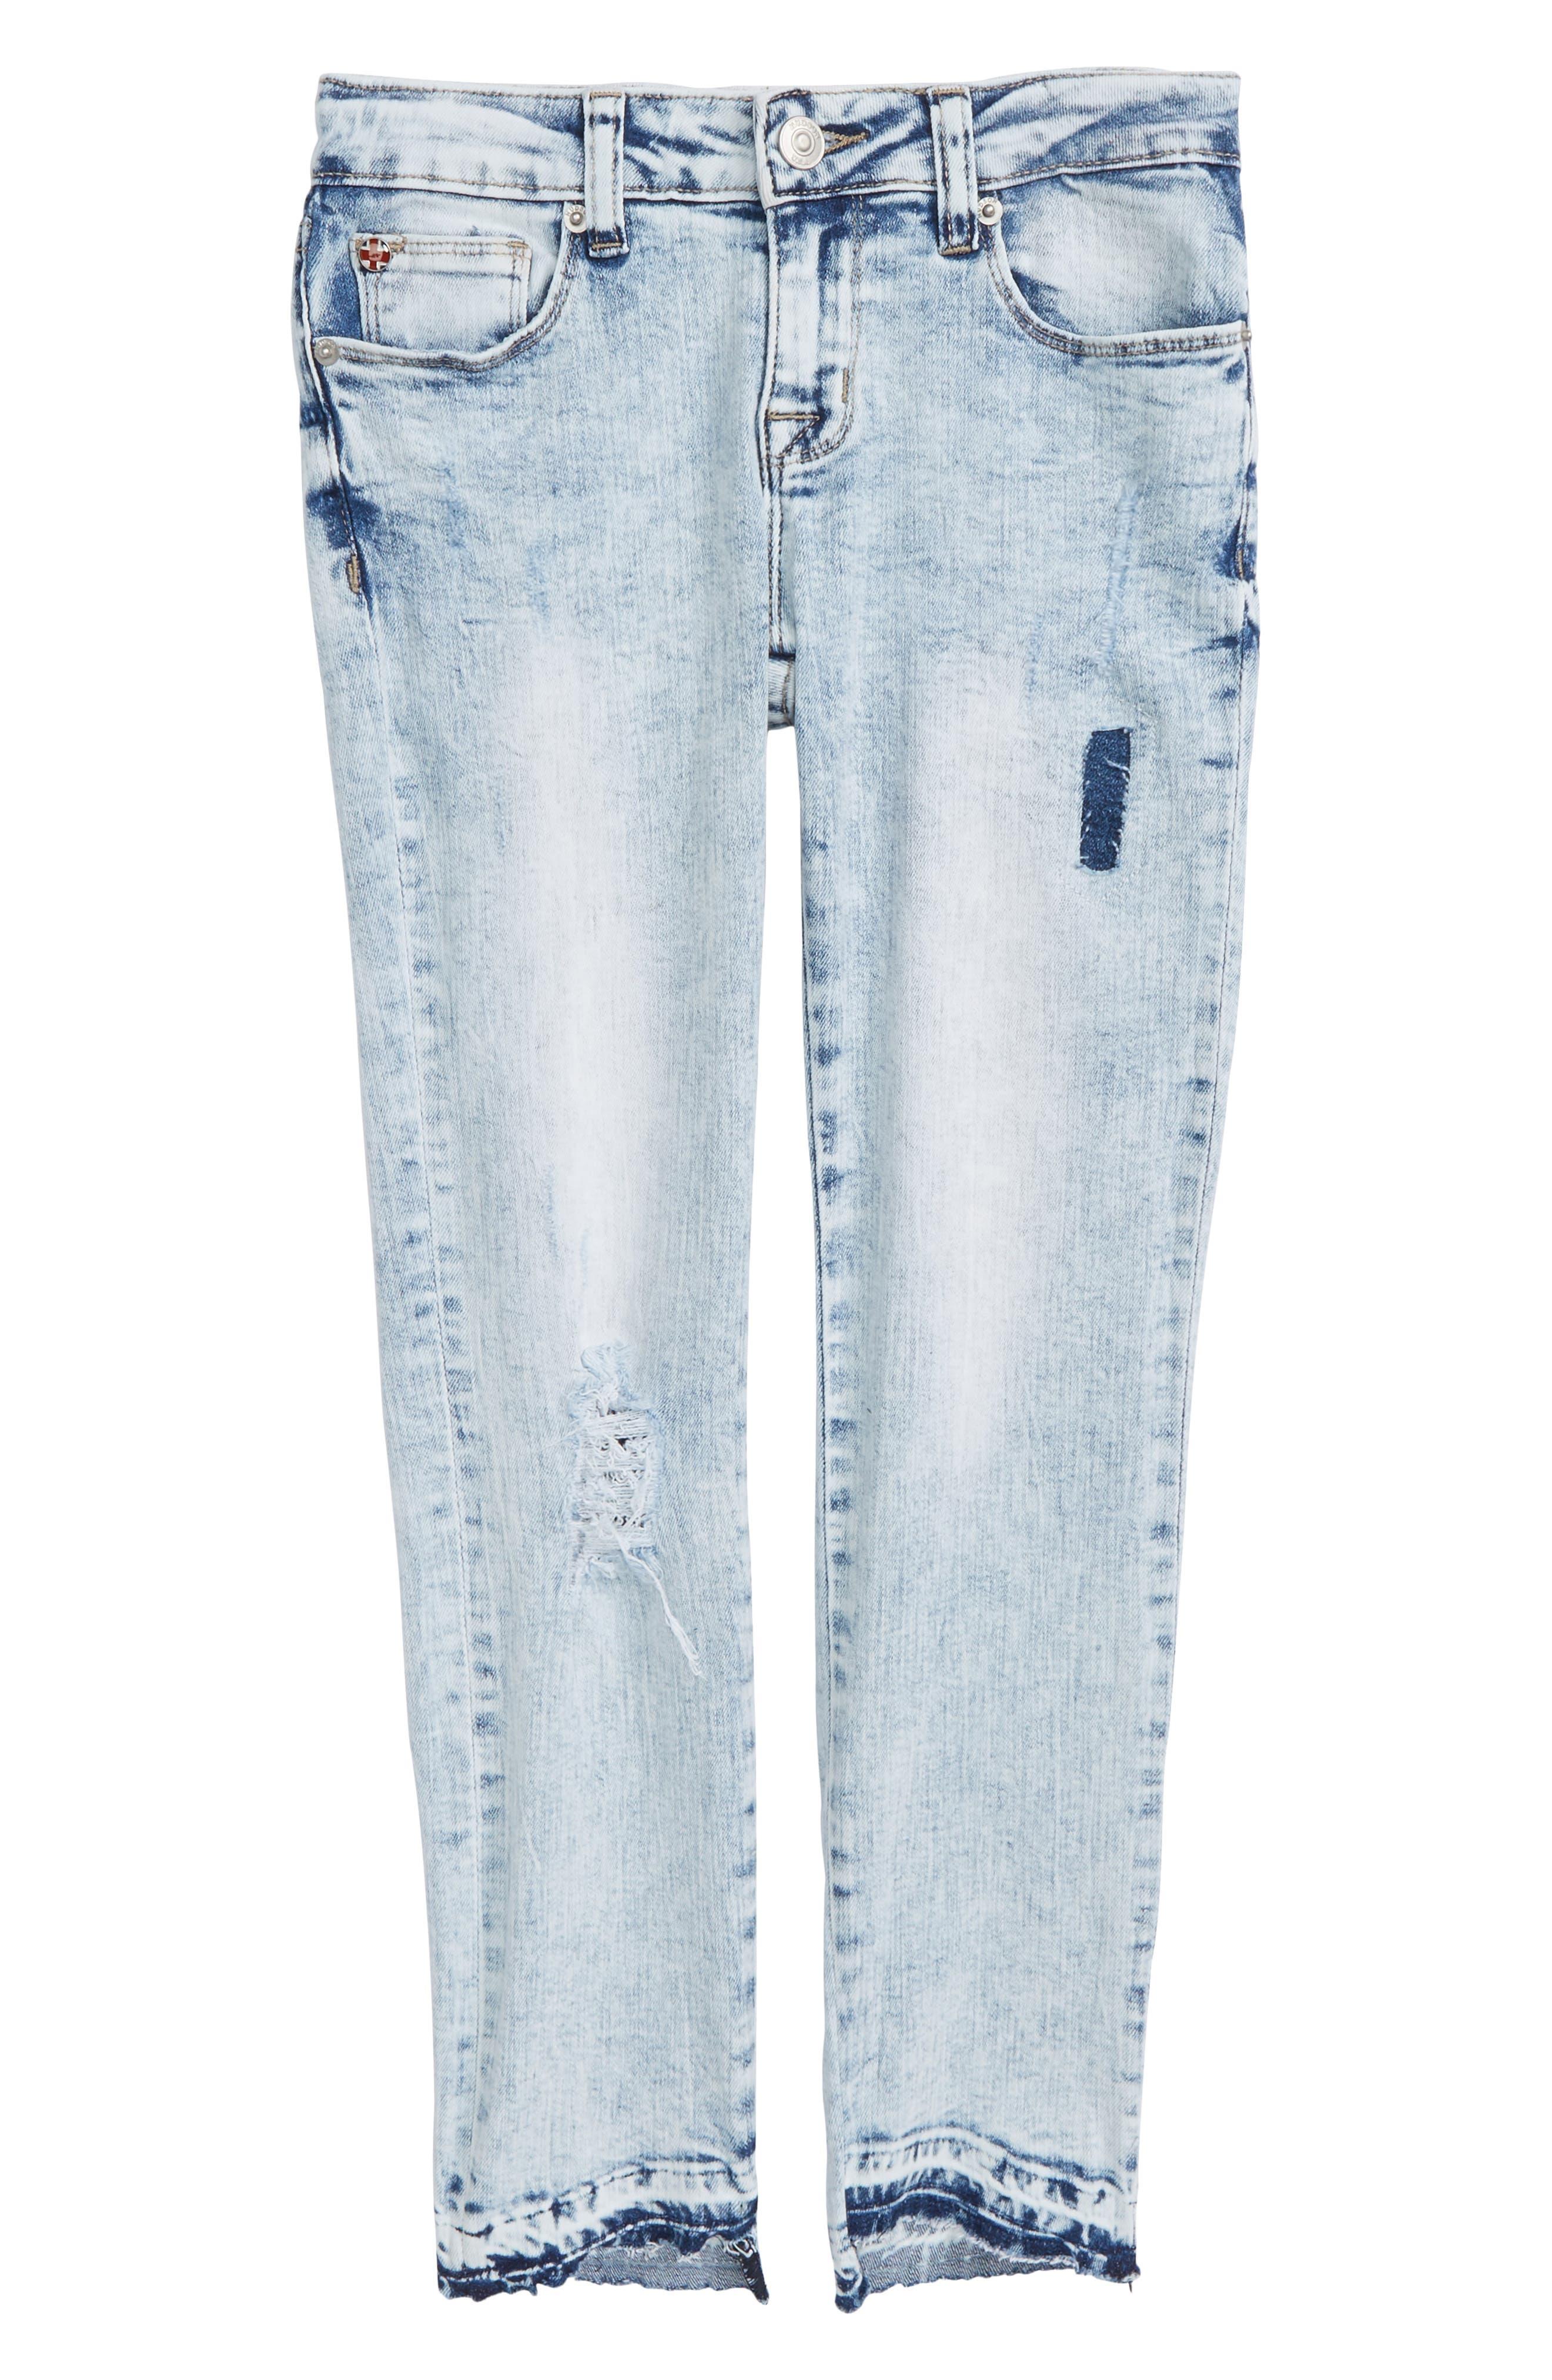 Vicky Crop Skinny Jeans,                             Main thumbnail 1, color,                             Iceberg Wash